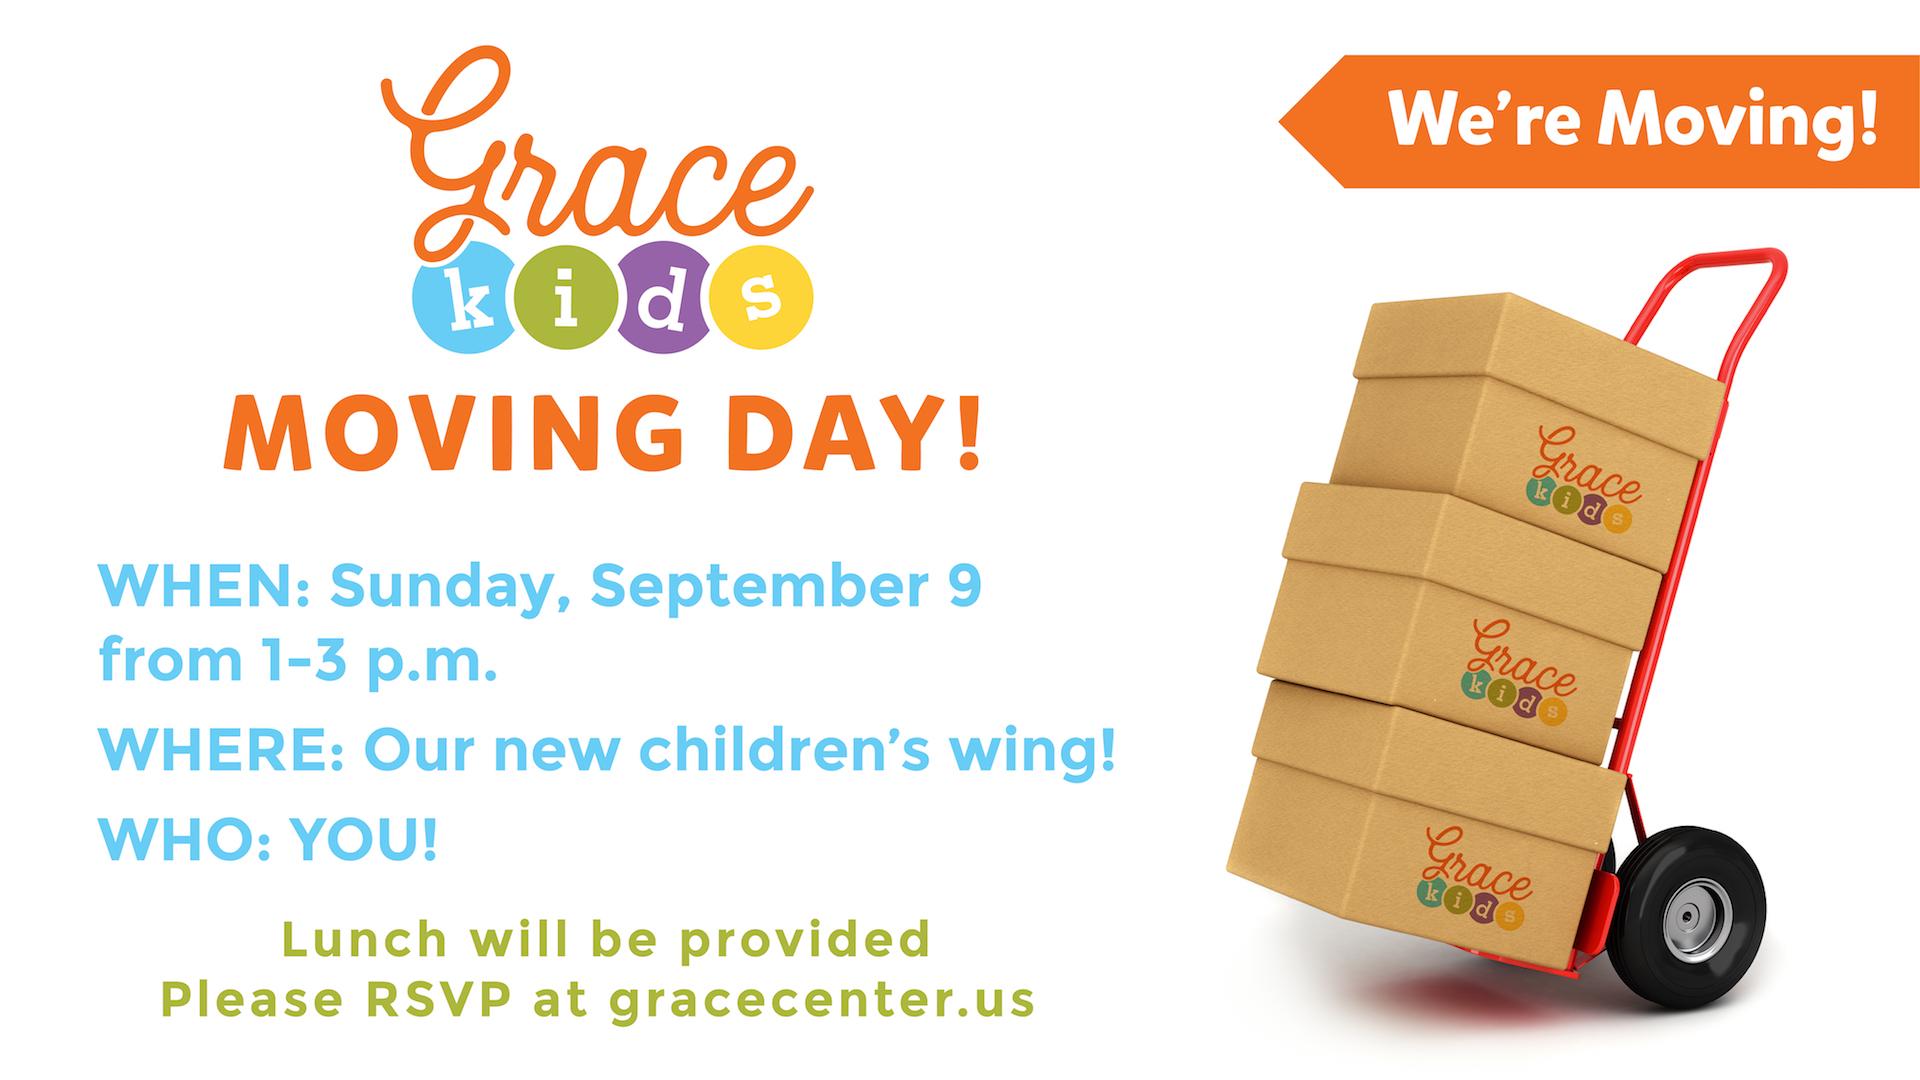 Grace Kids Moving Day-02.jpg